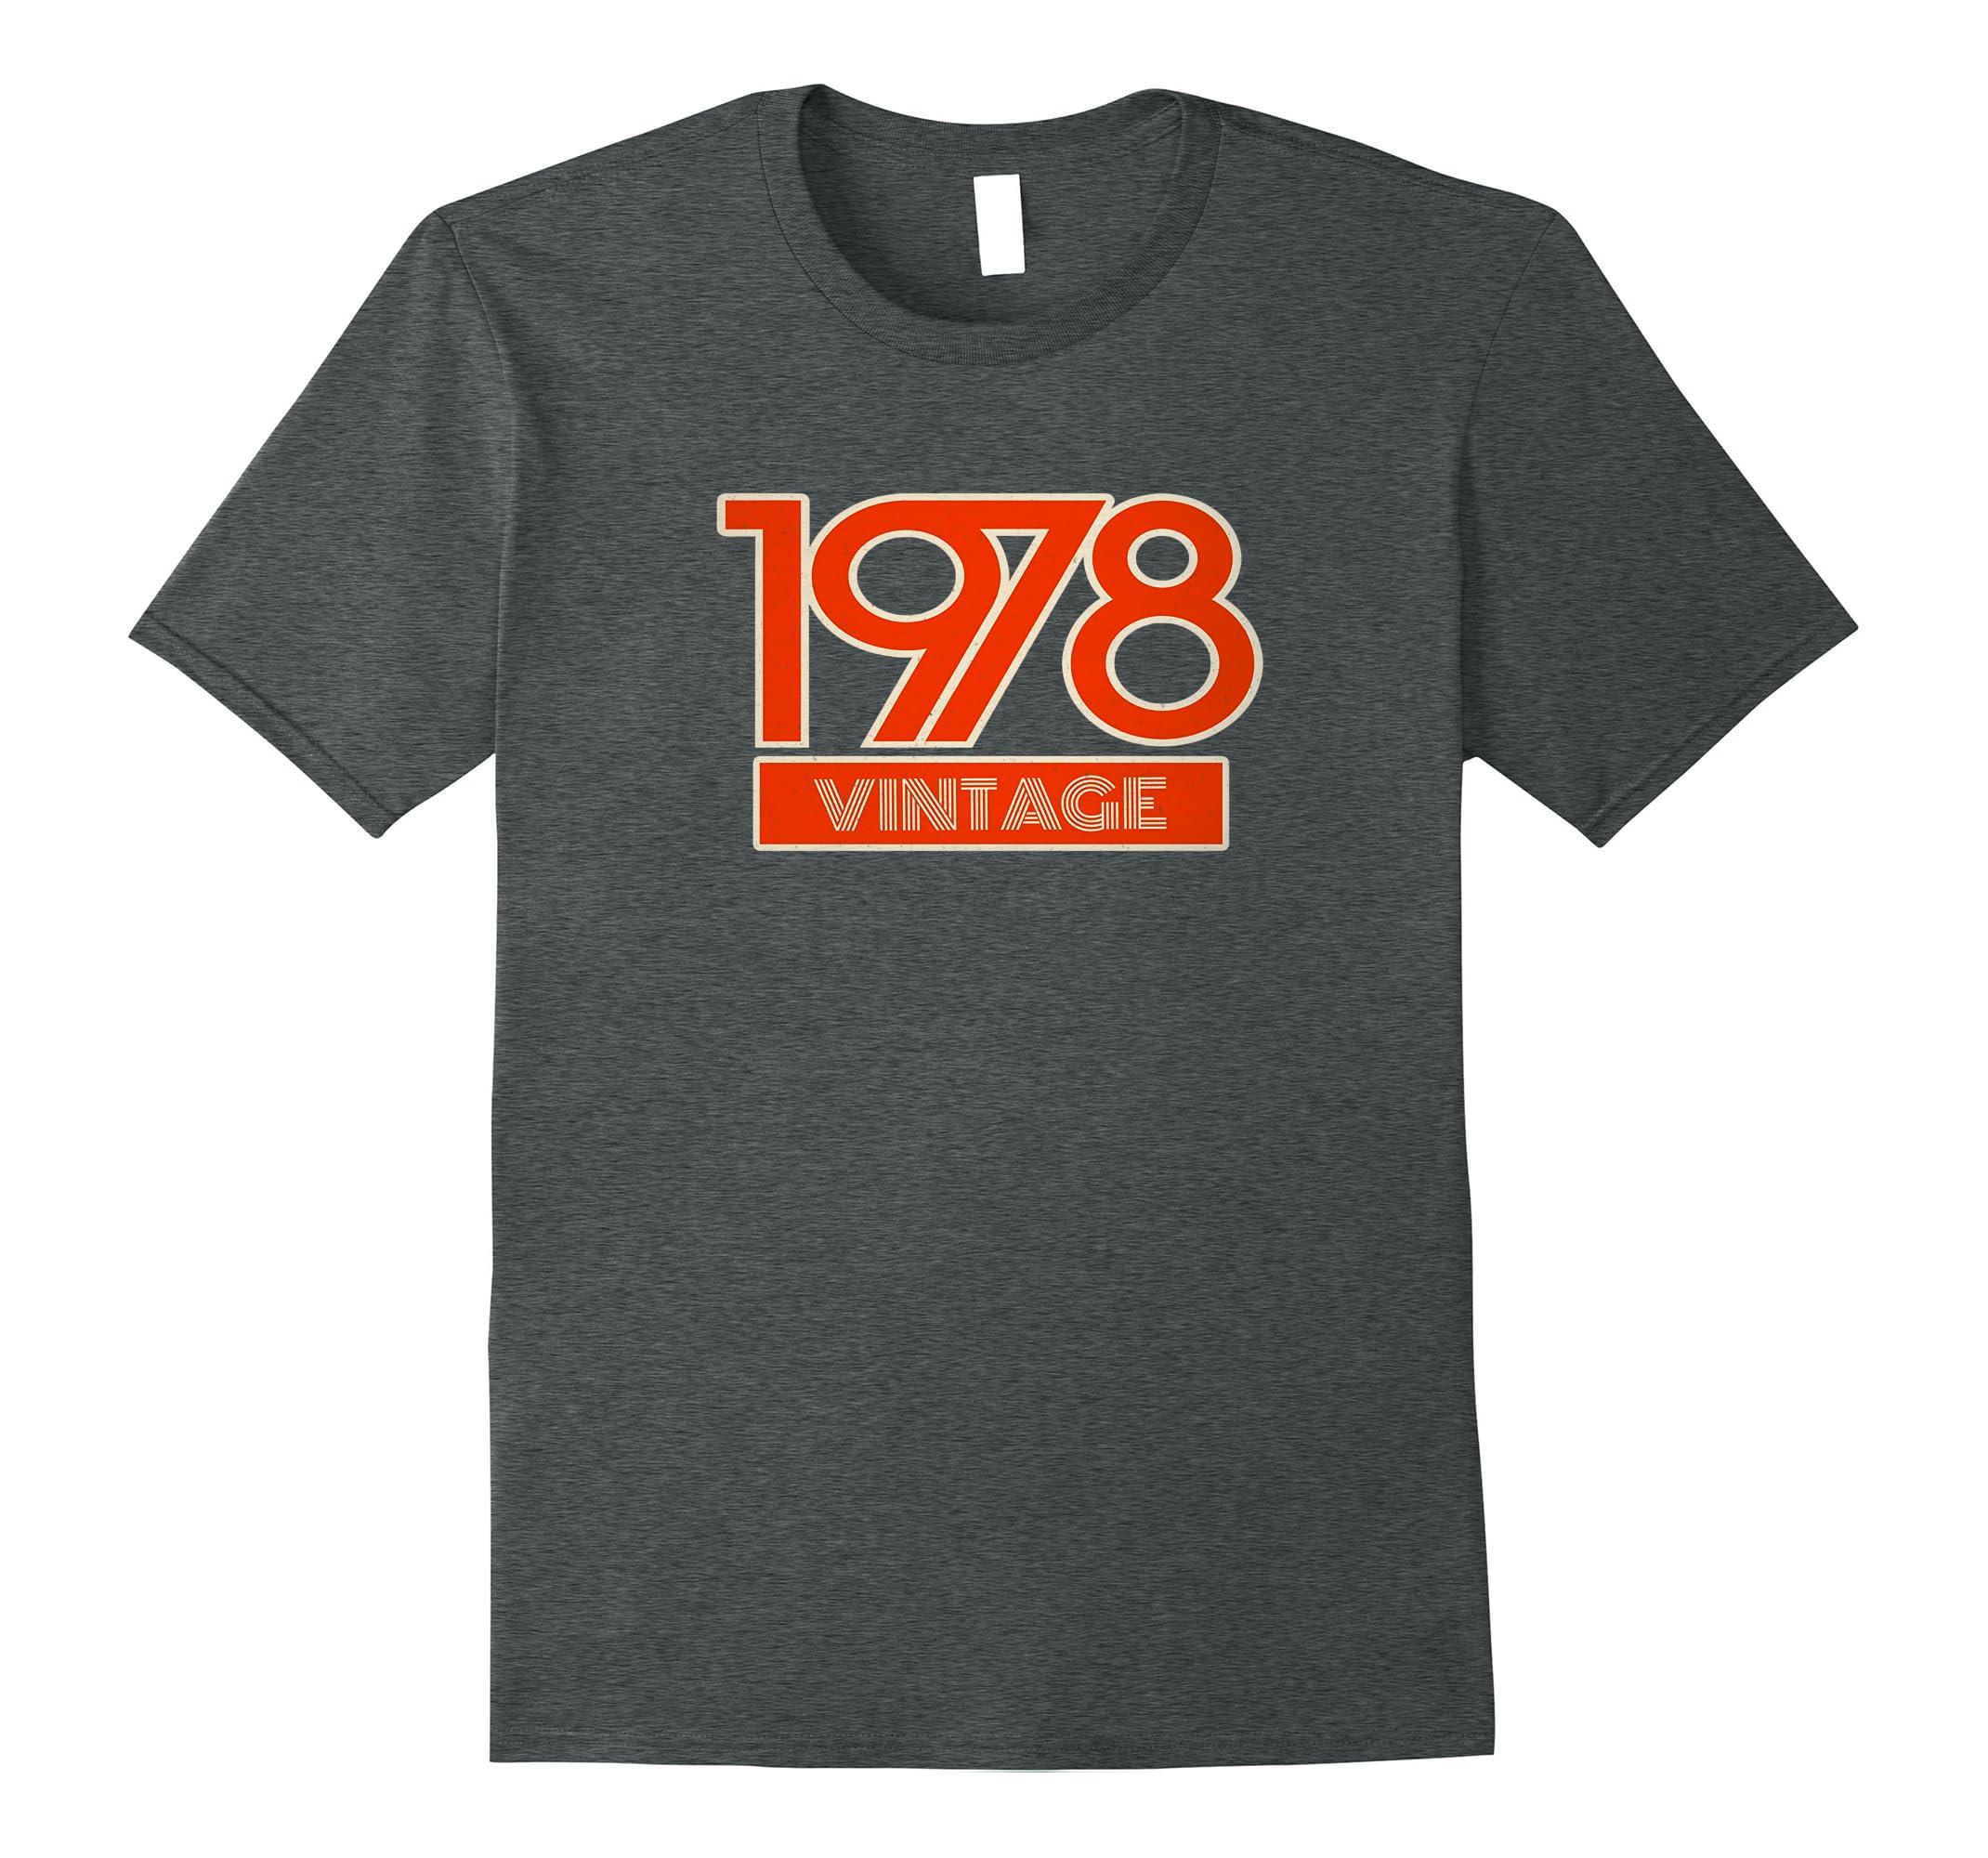 40th Birthday Shirt - Vintage 1978 Birthday T Shirt-ah my shirt one gift